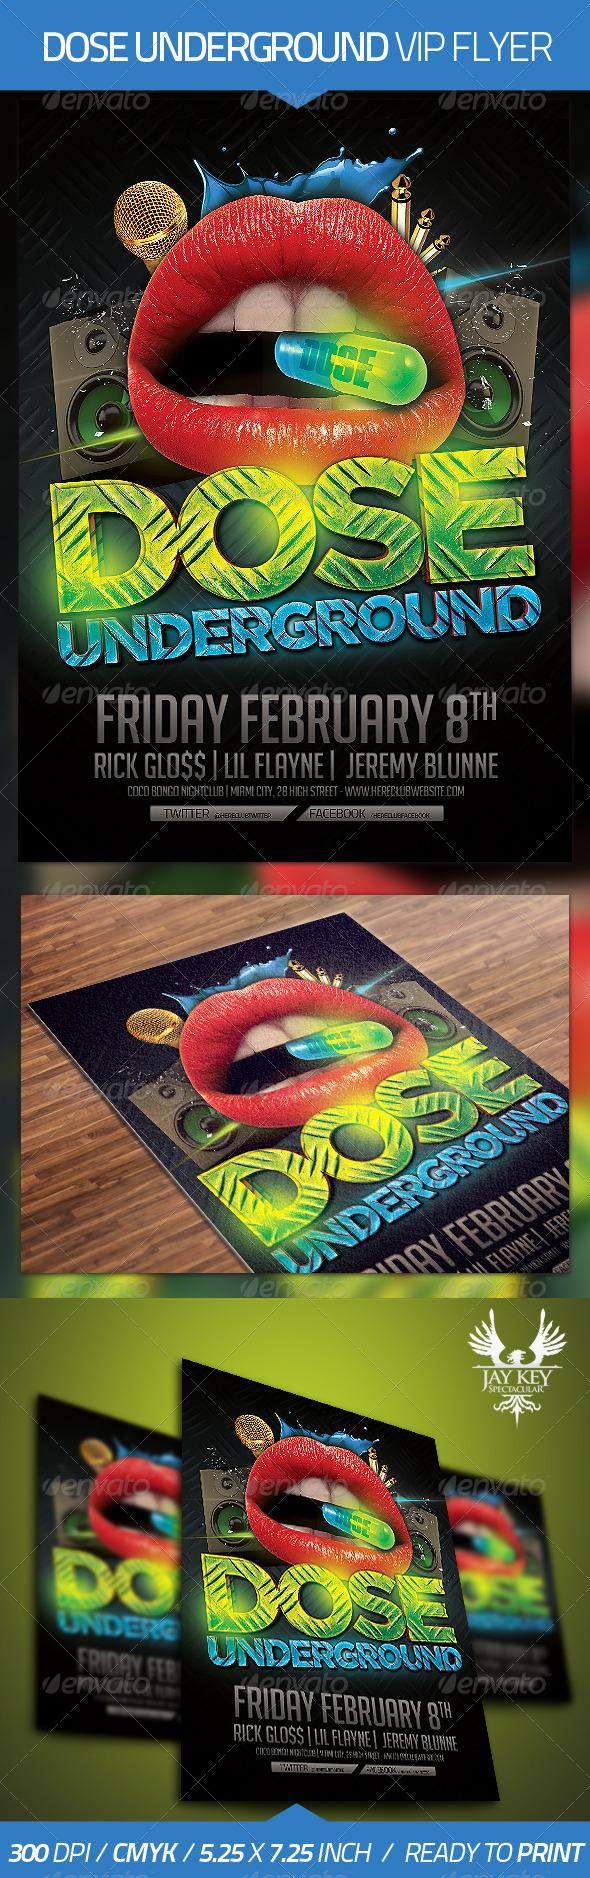 Dose Underground Hip Hop Flyer - Clubs & Parties Events